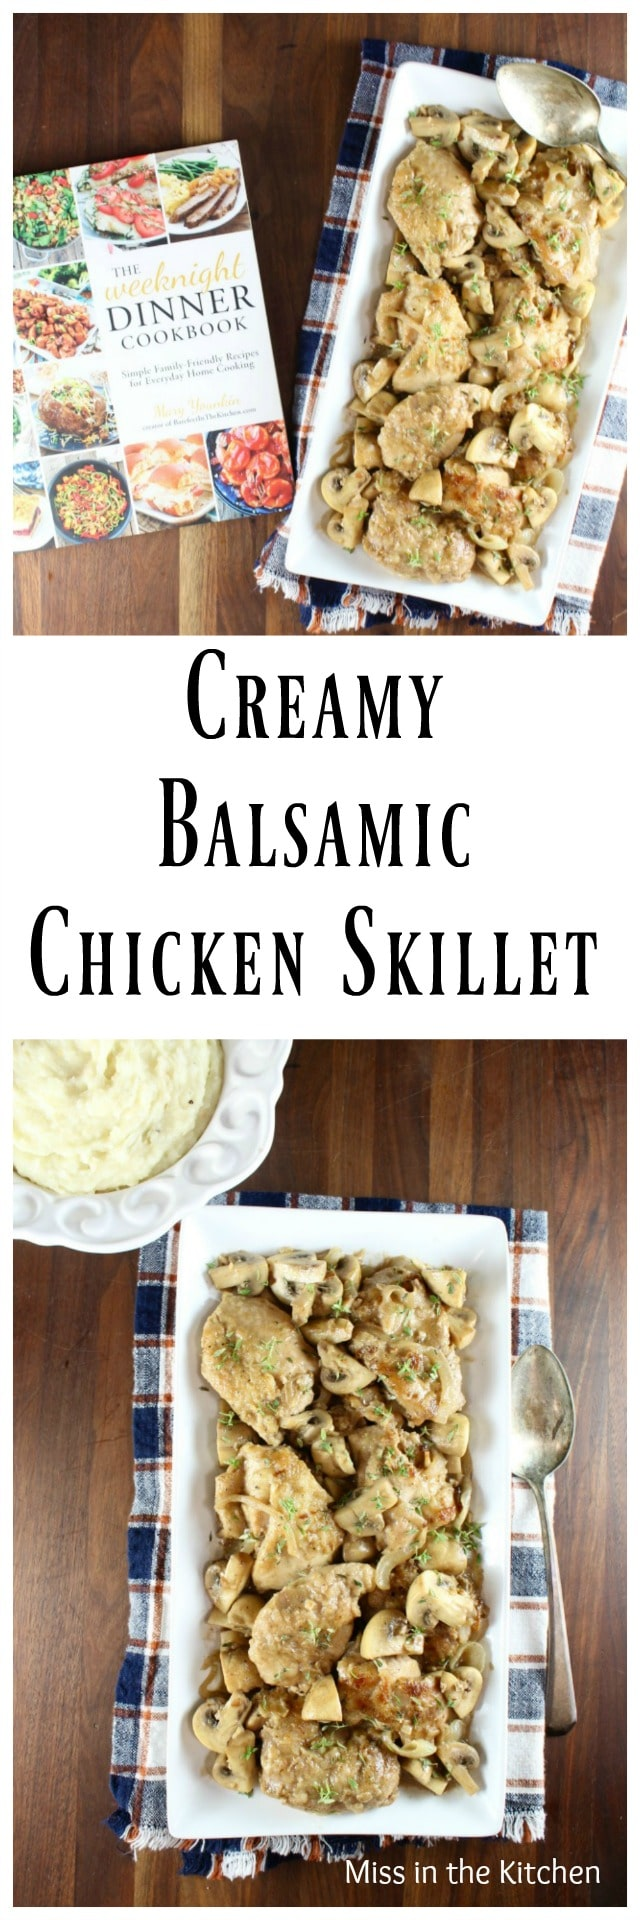 Creamy Balsamic Chicken Skillet Dinner Recipe from The Weeknight Dinner Cookbook ~ MissintheKitchen.com